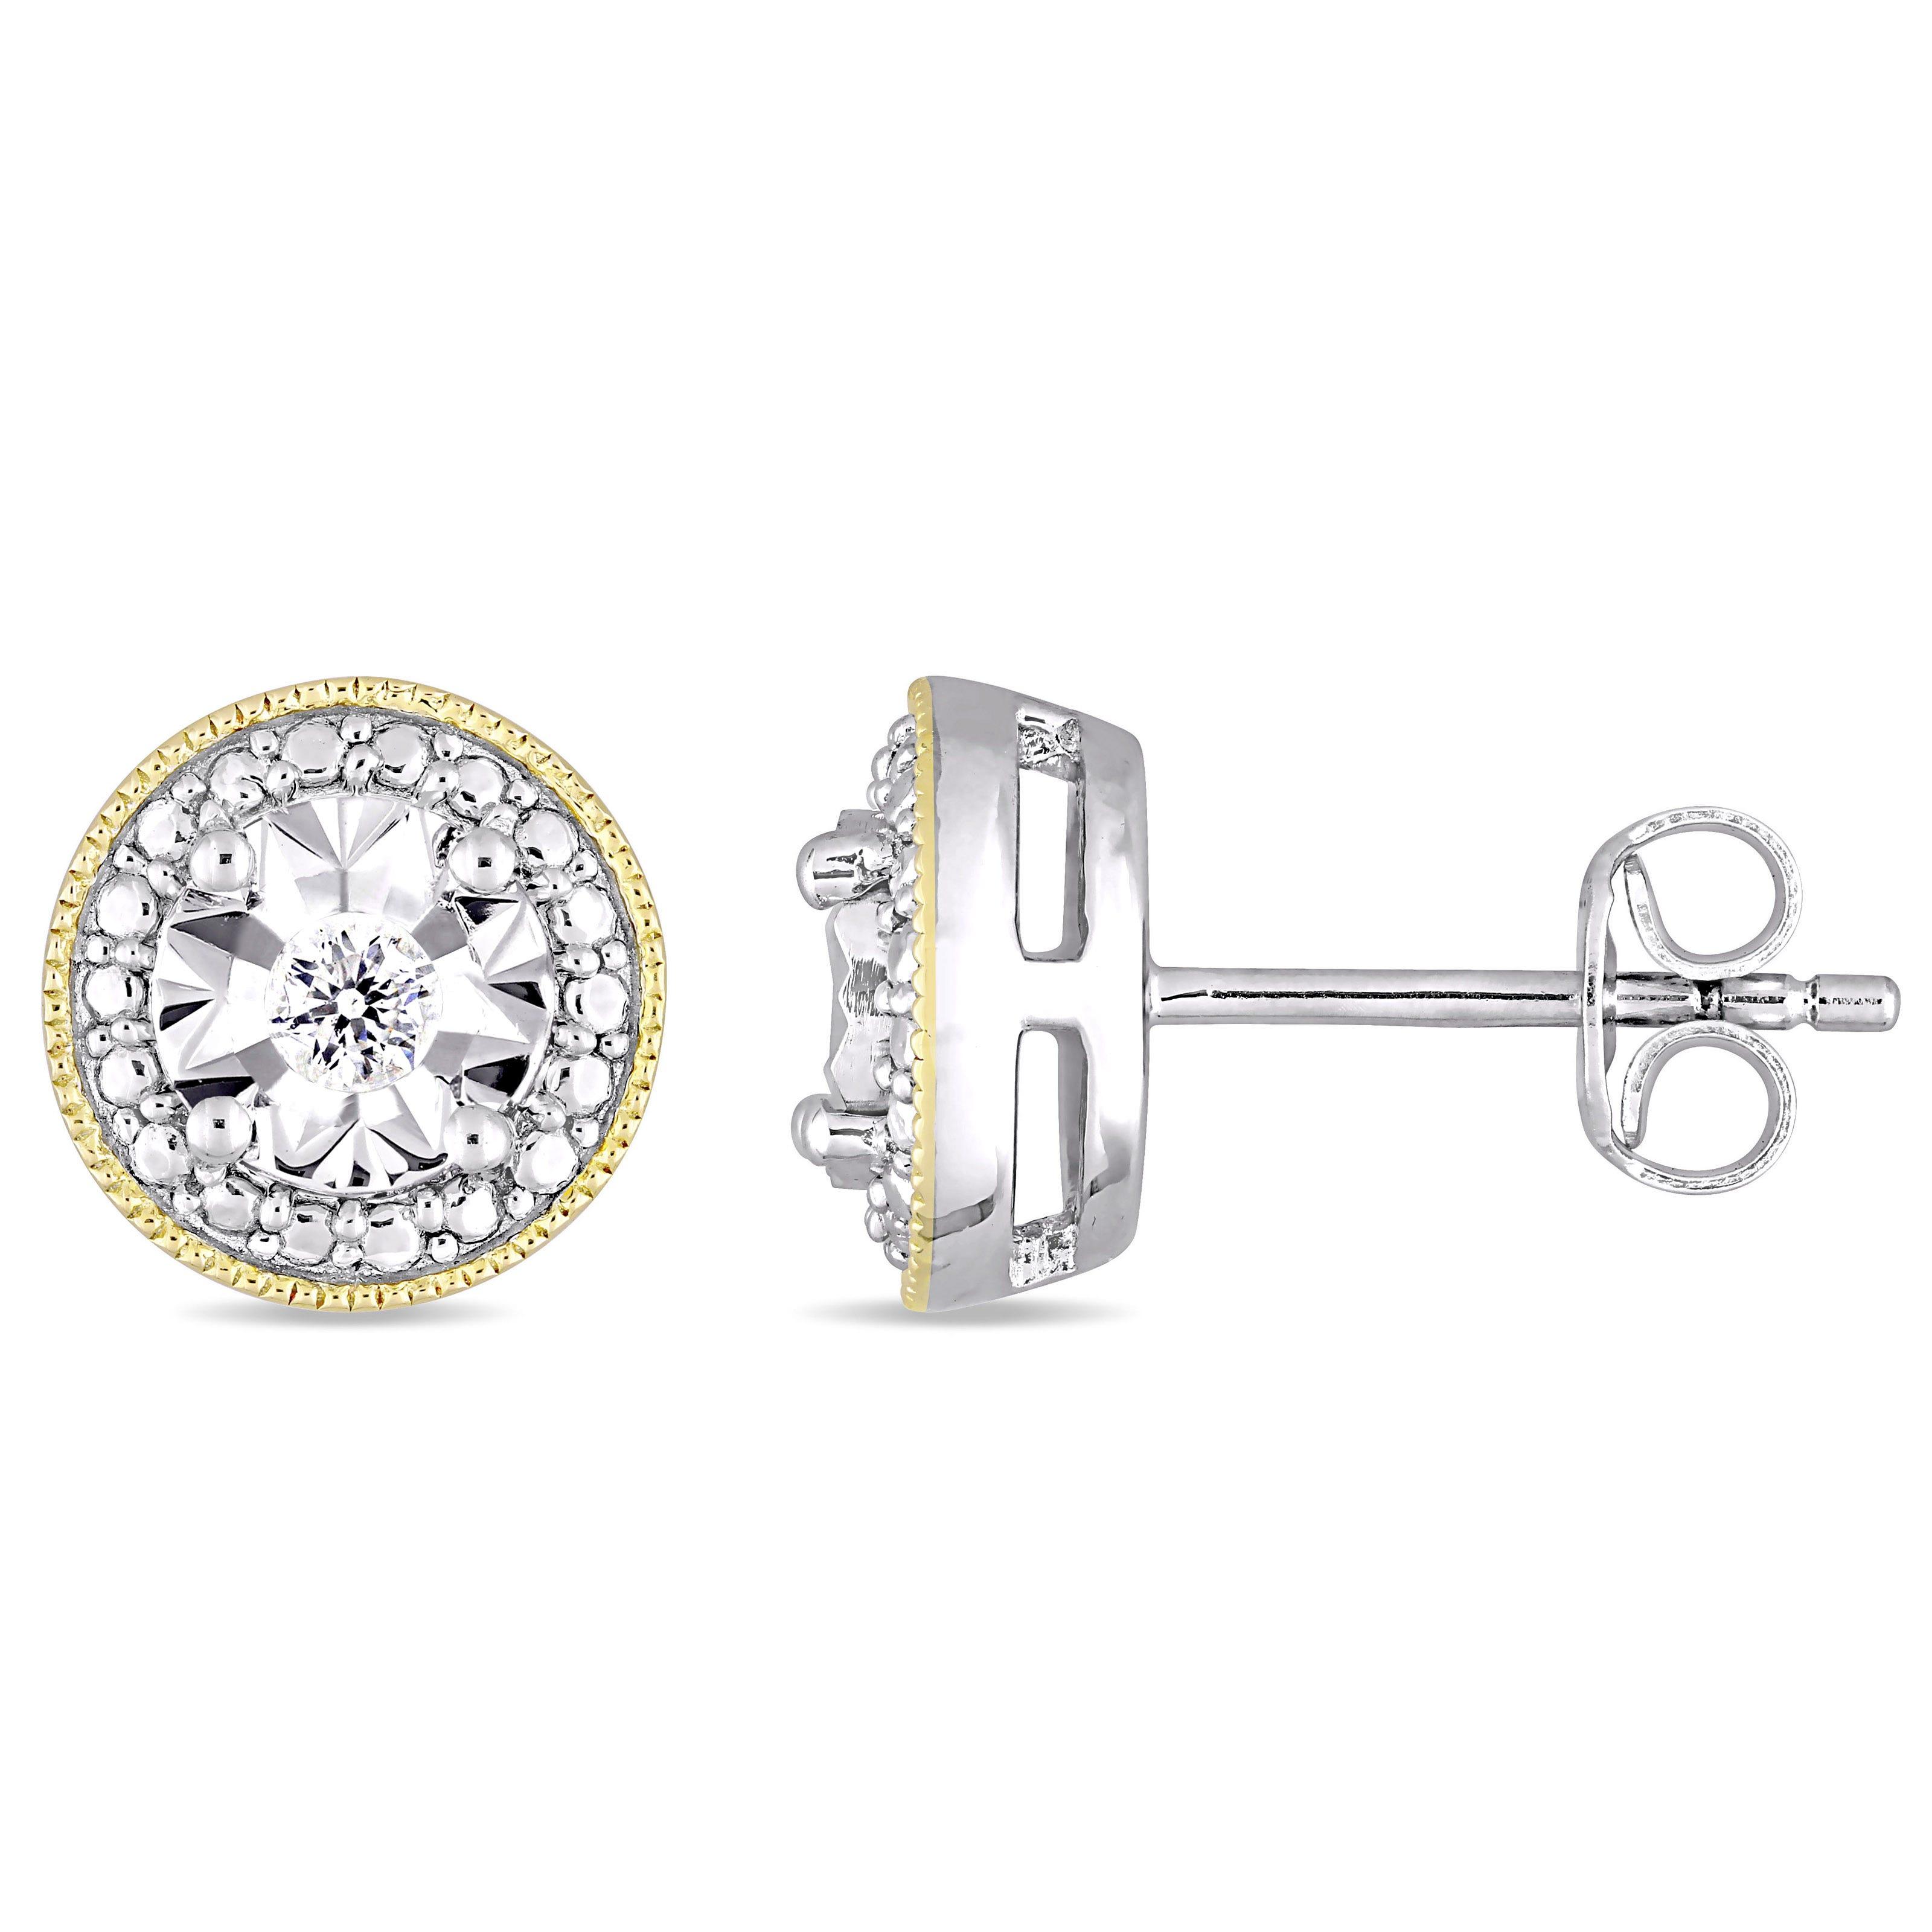 Diamond Milgrain Filigree 1/10ctw Stud Earrings in Yellow Plated Sterling Silver